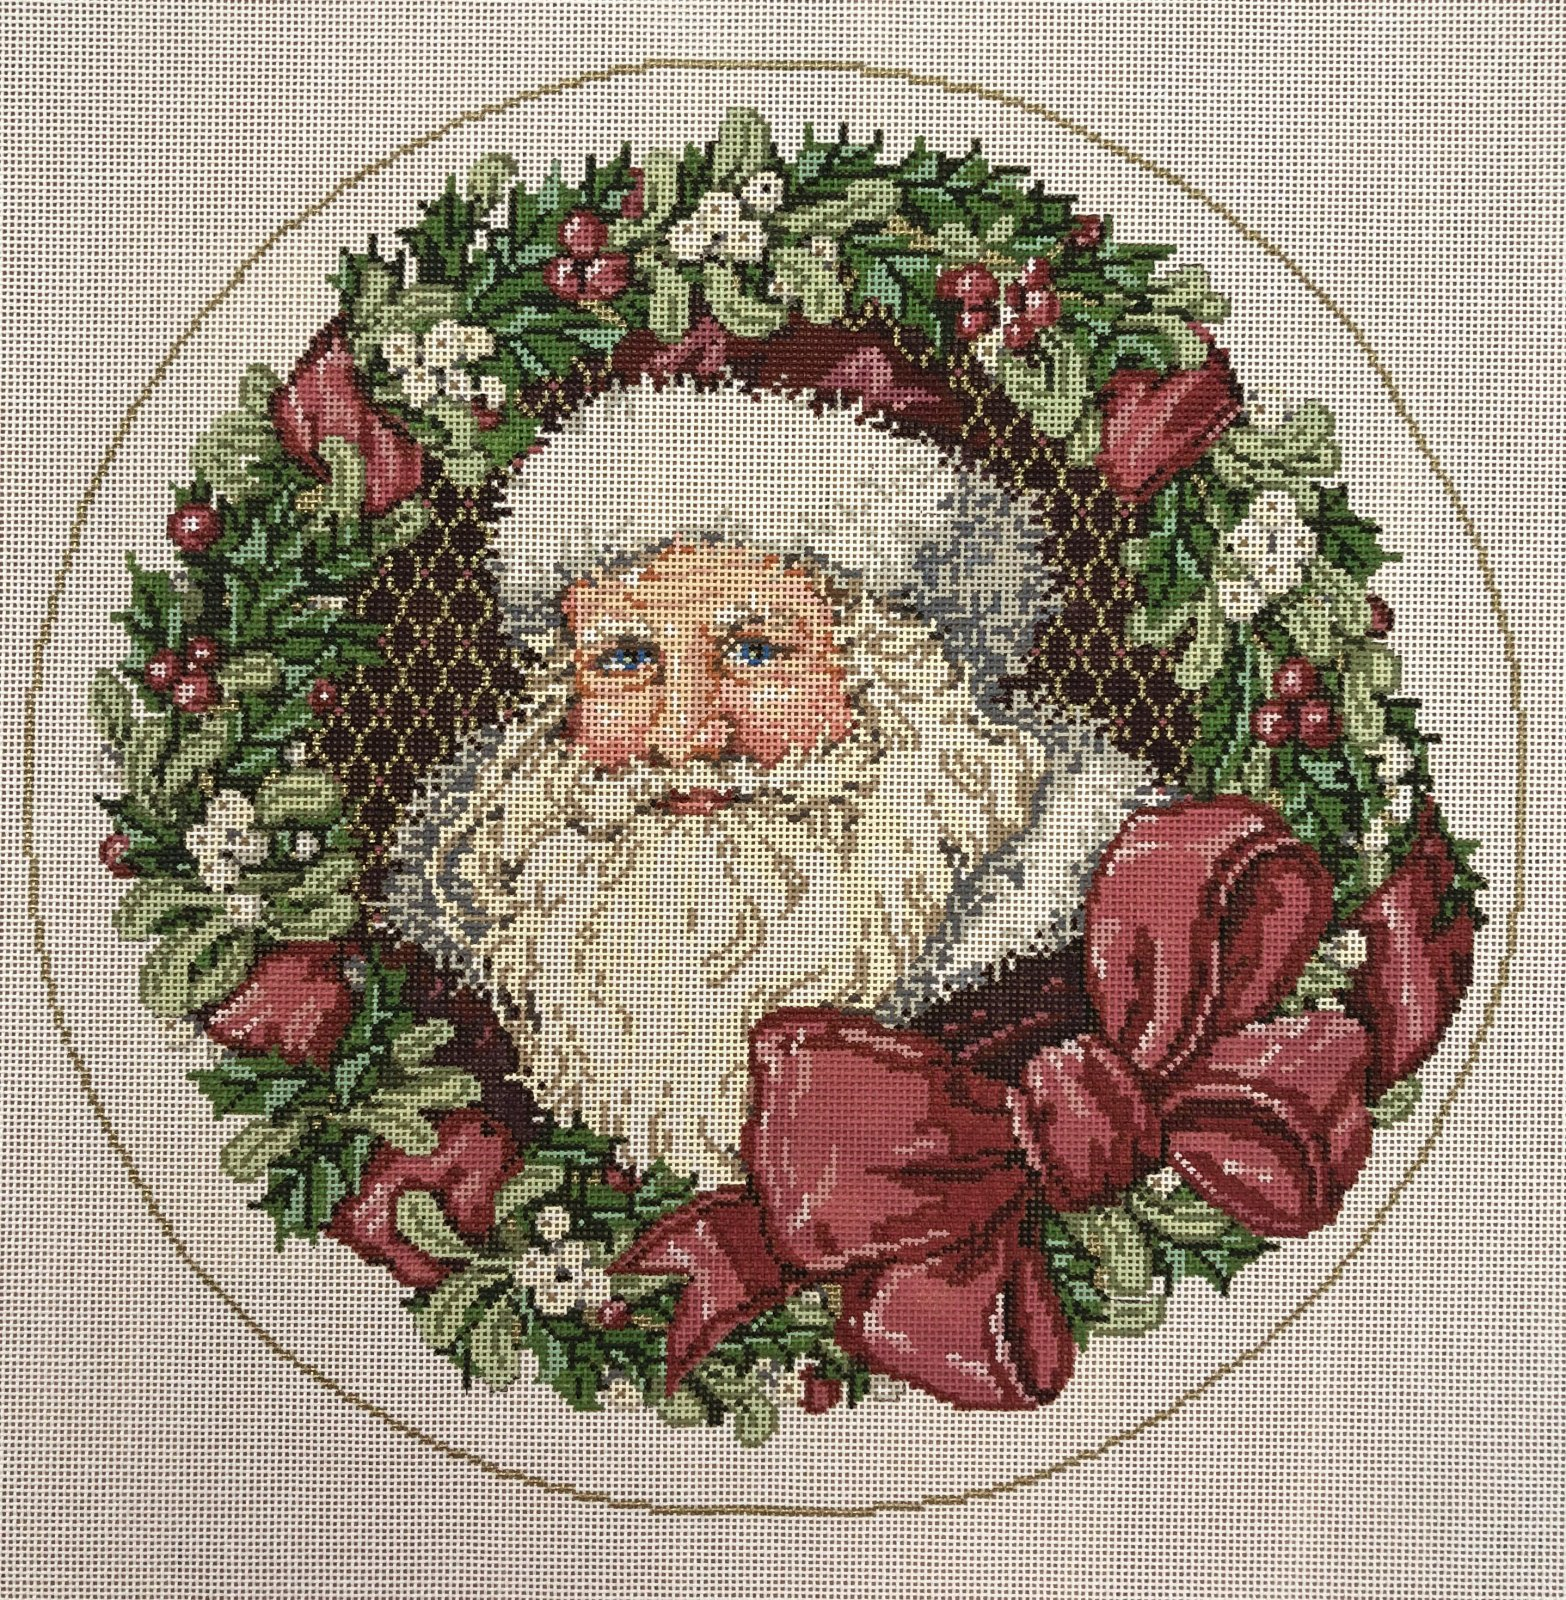 santa's wreath